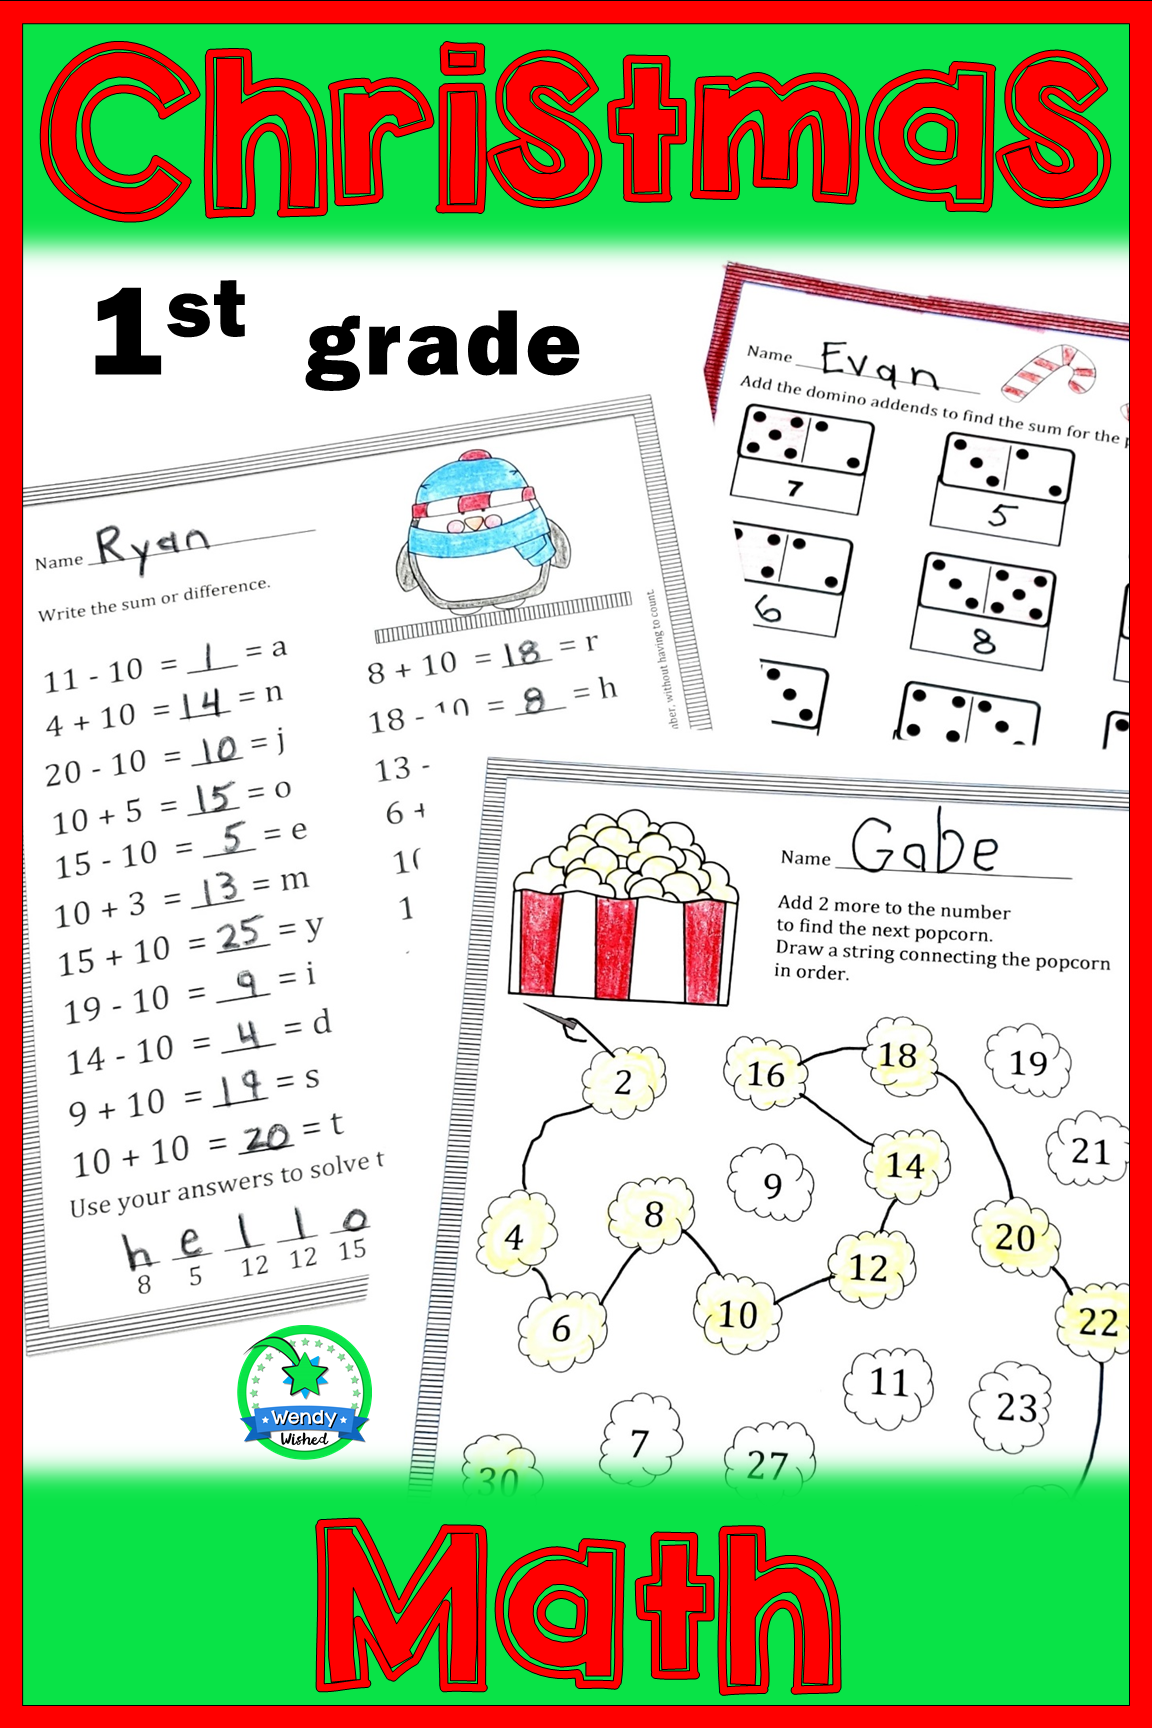 medium resolution of Christmas Math Worksheets for 1st grade   Christmas math worksheets